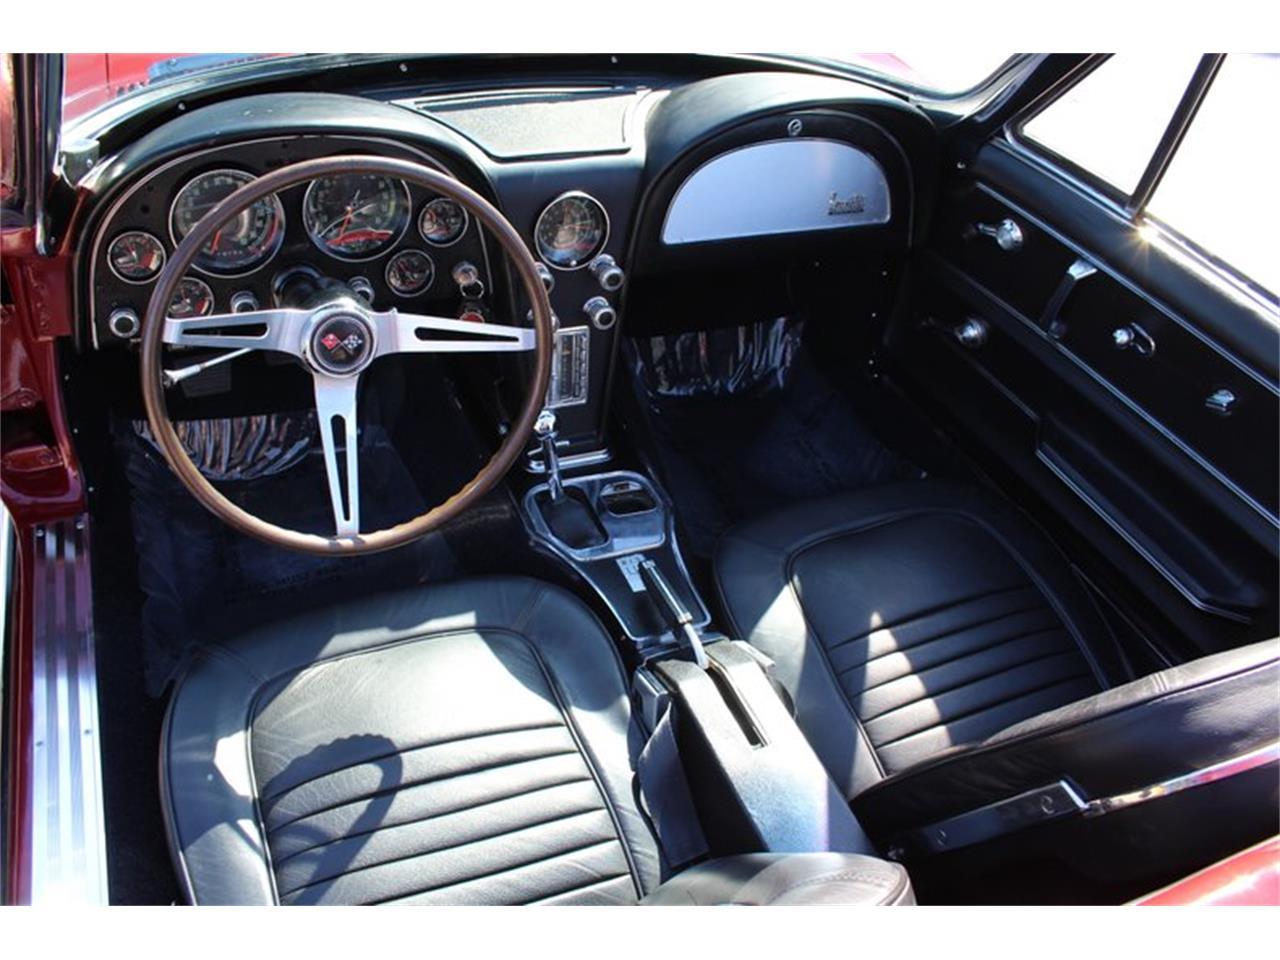 Large Picture of '67 Chevrolet Corvette Stingray - $54,900.00 - PVTL